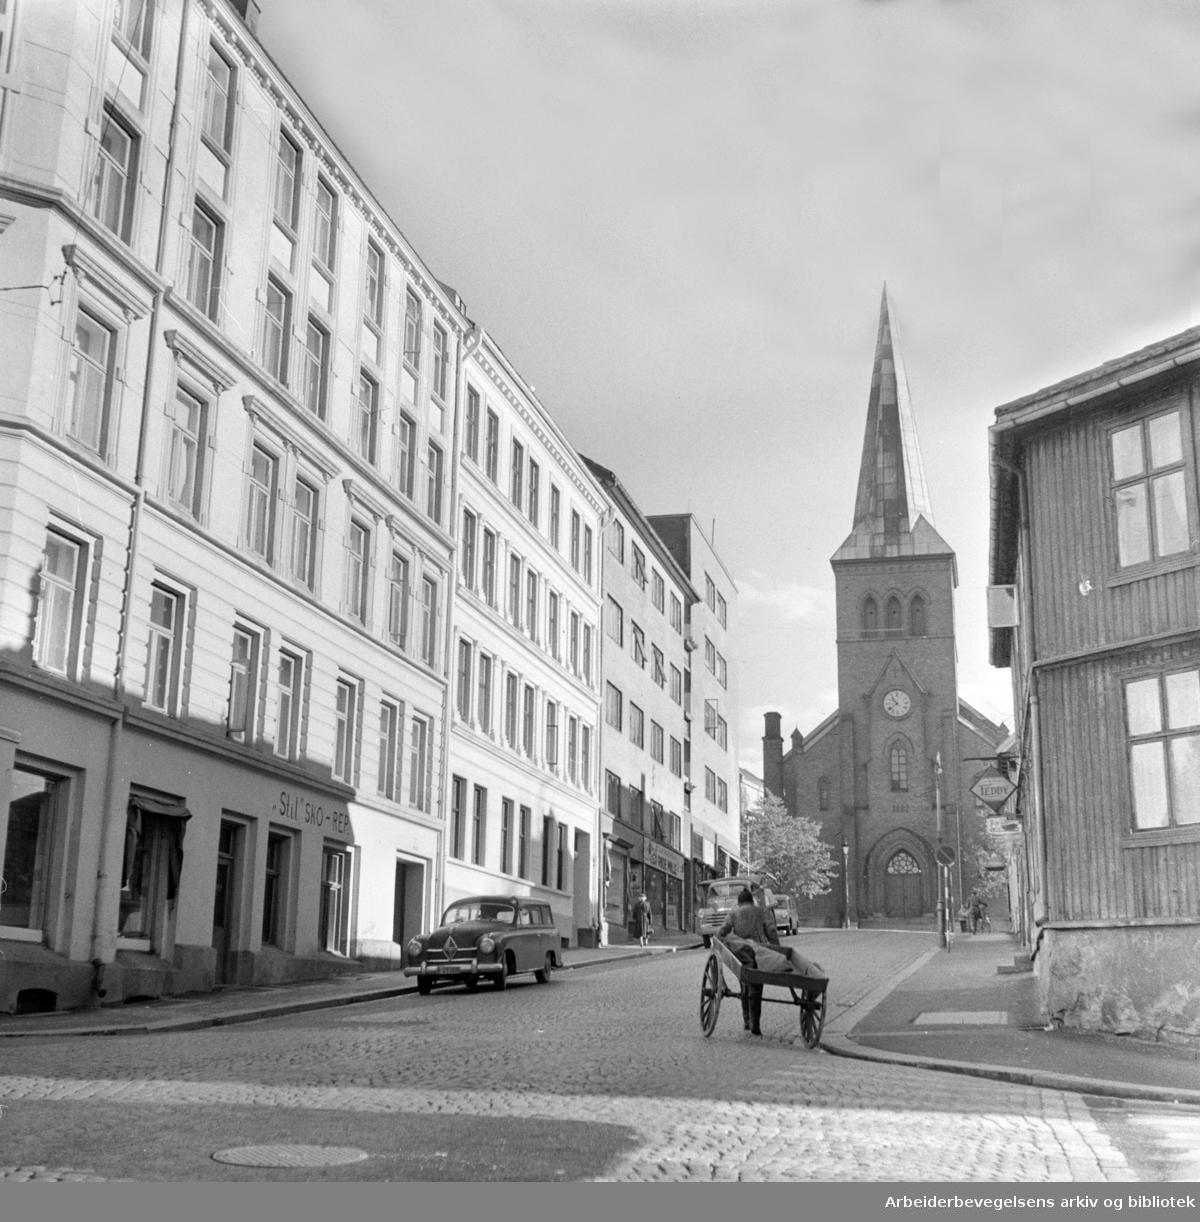 Nannestadgata på Kampen. November 1957